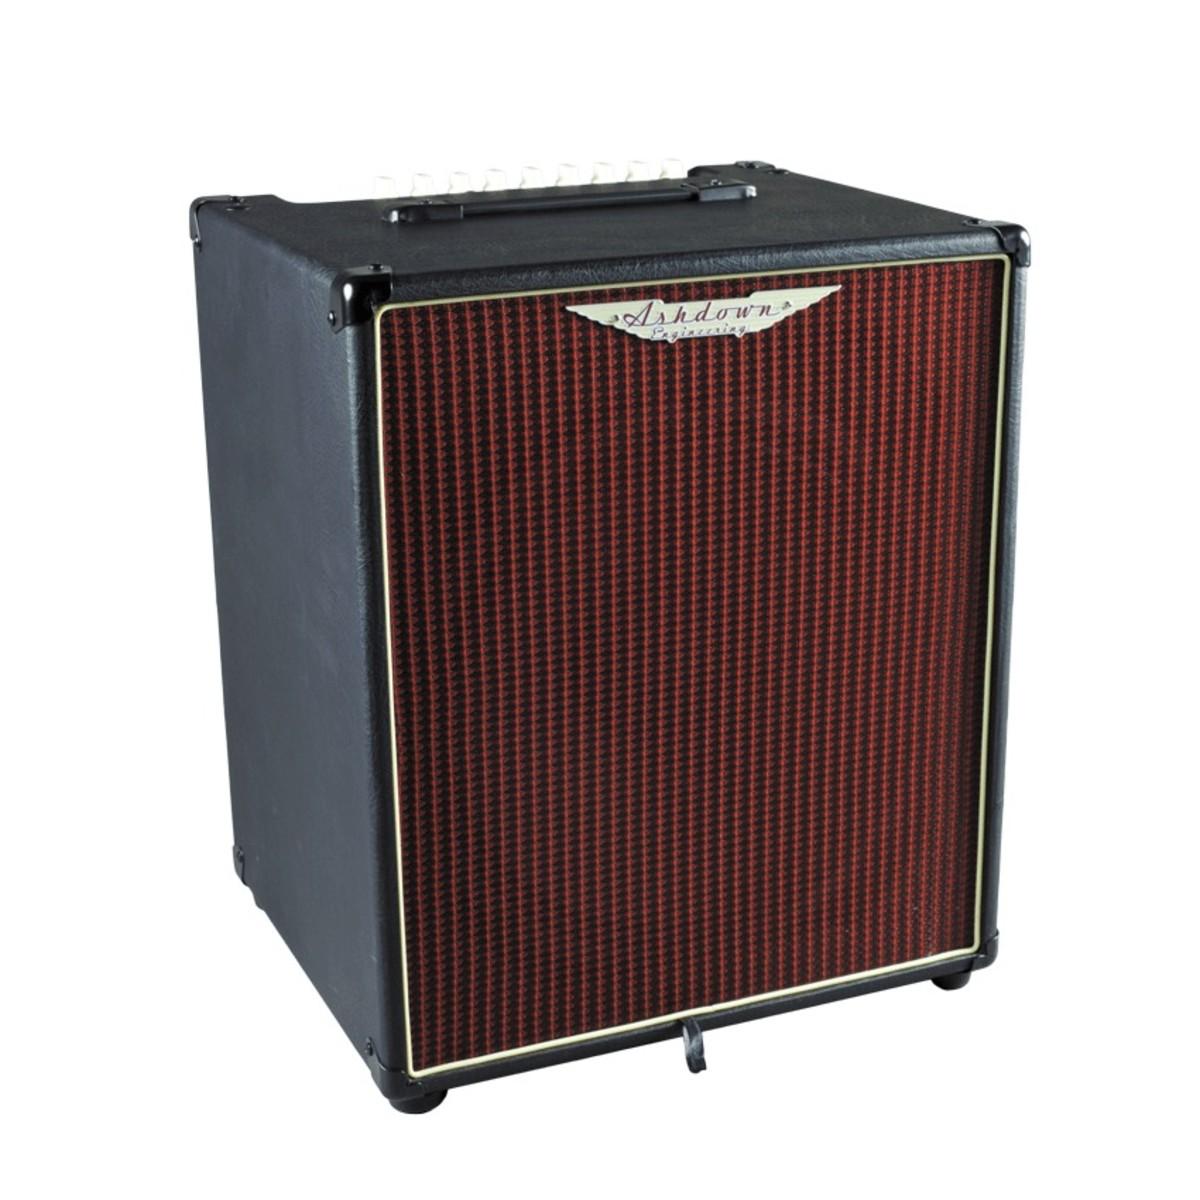 Bass zosilňovač Ashdown AAA 120 watt 15t